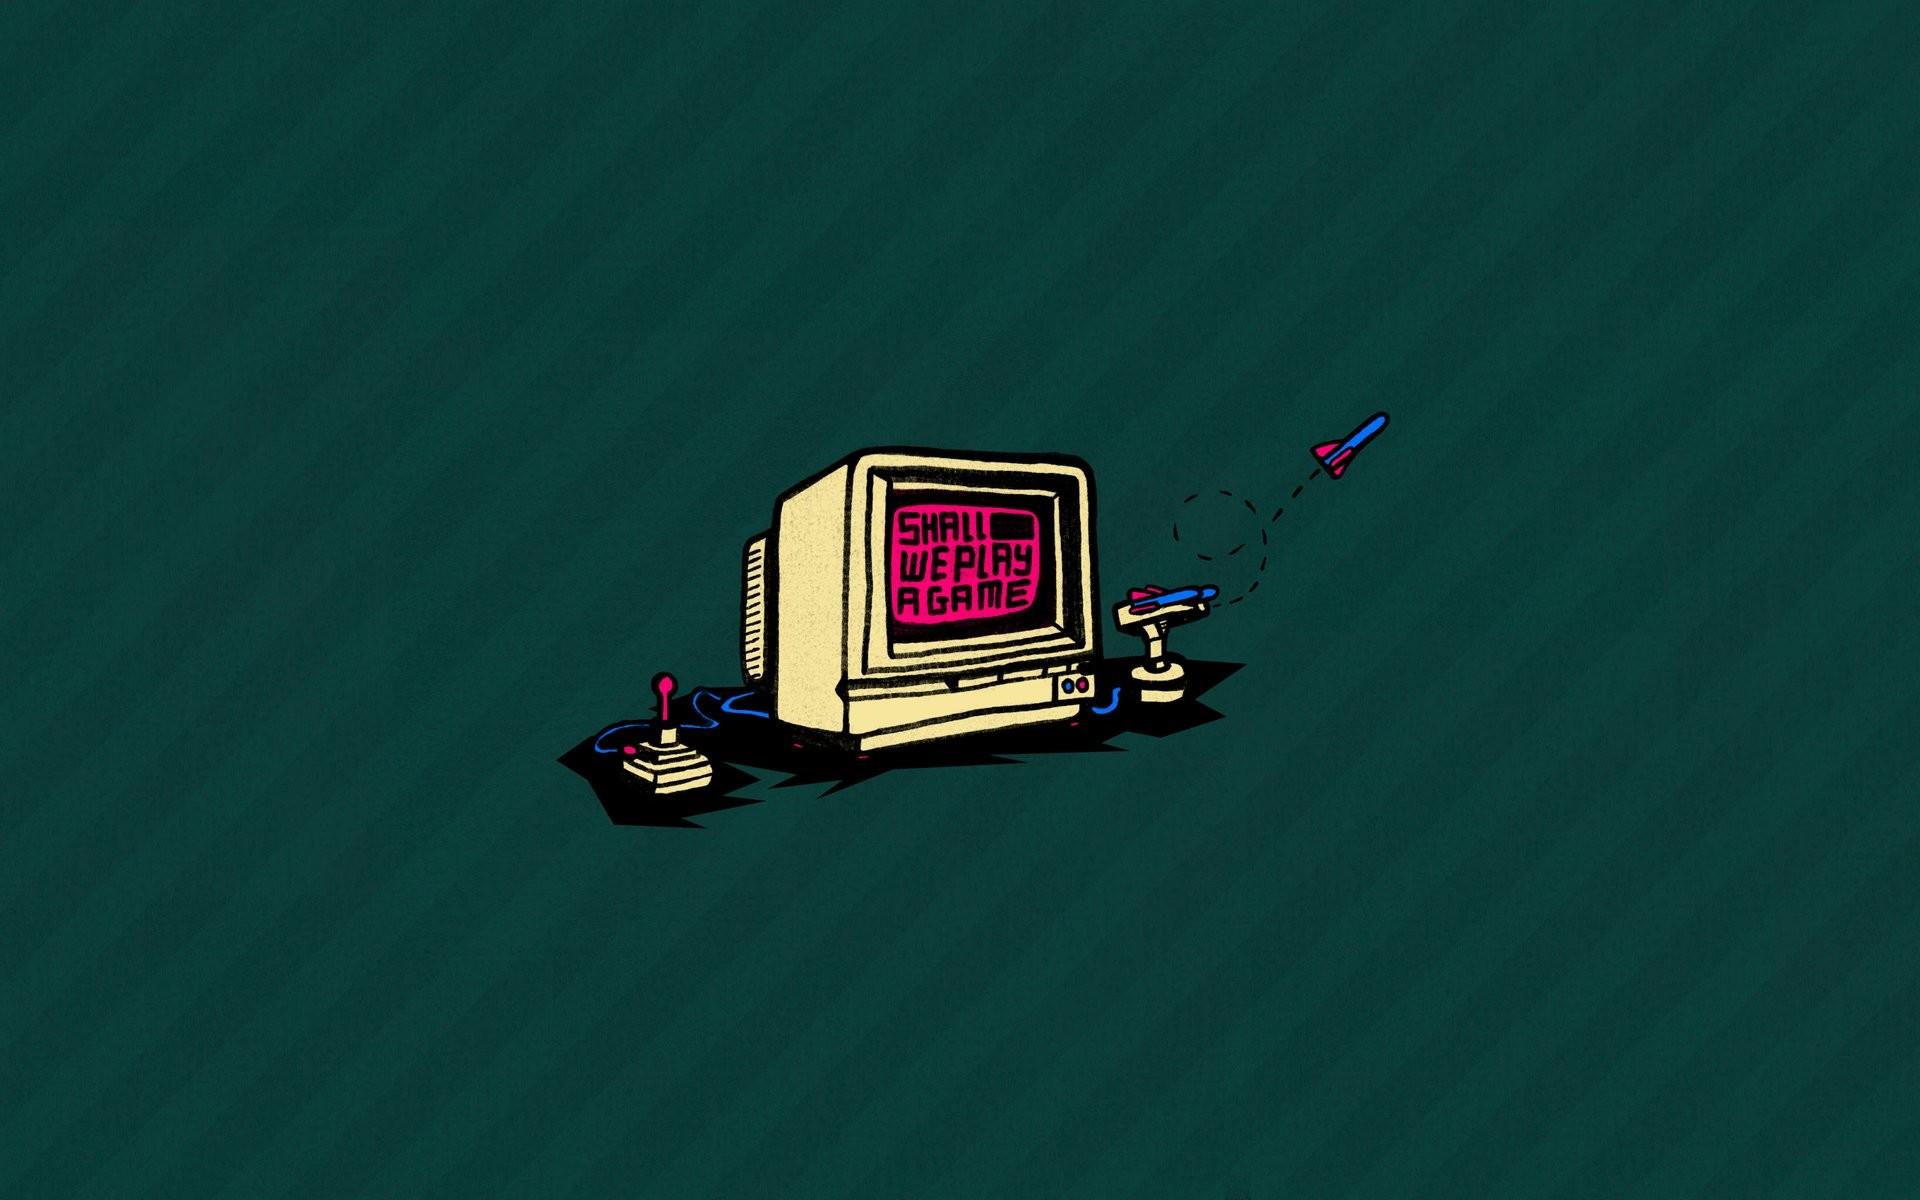 Retro Video Game Wallpaper TrendHuntercom